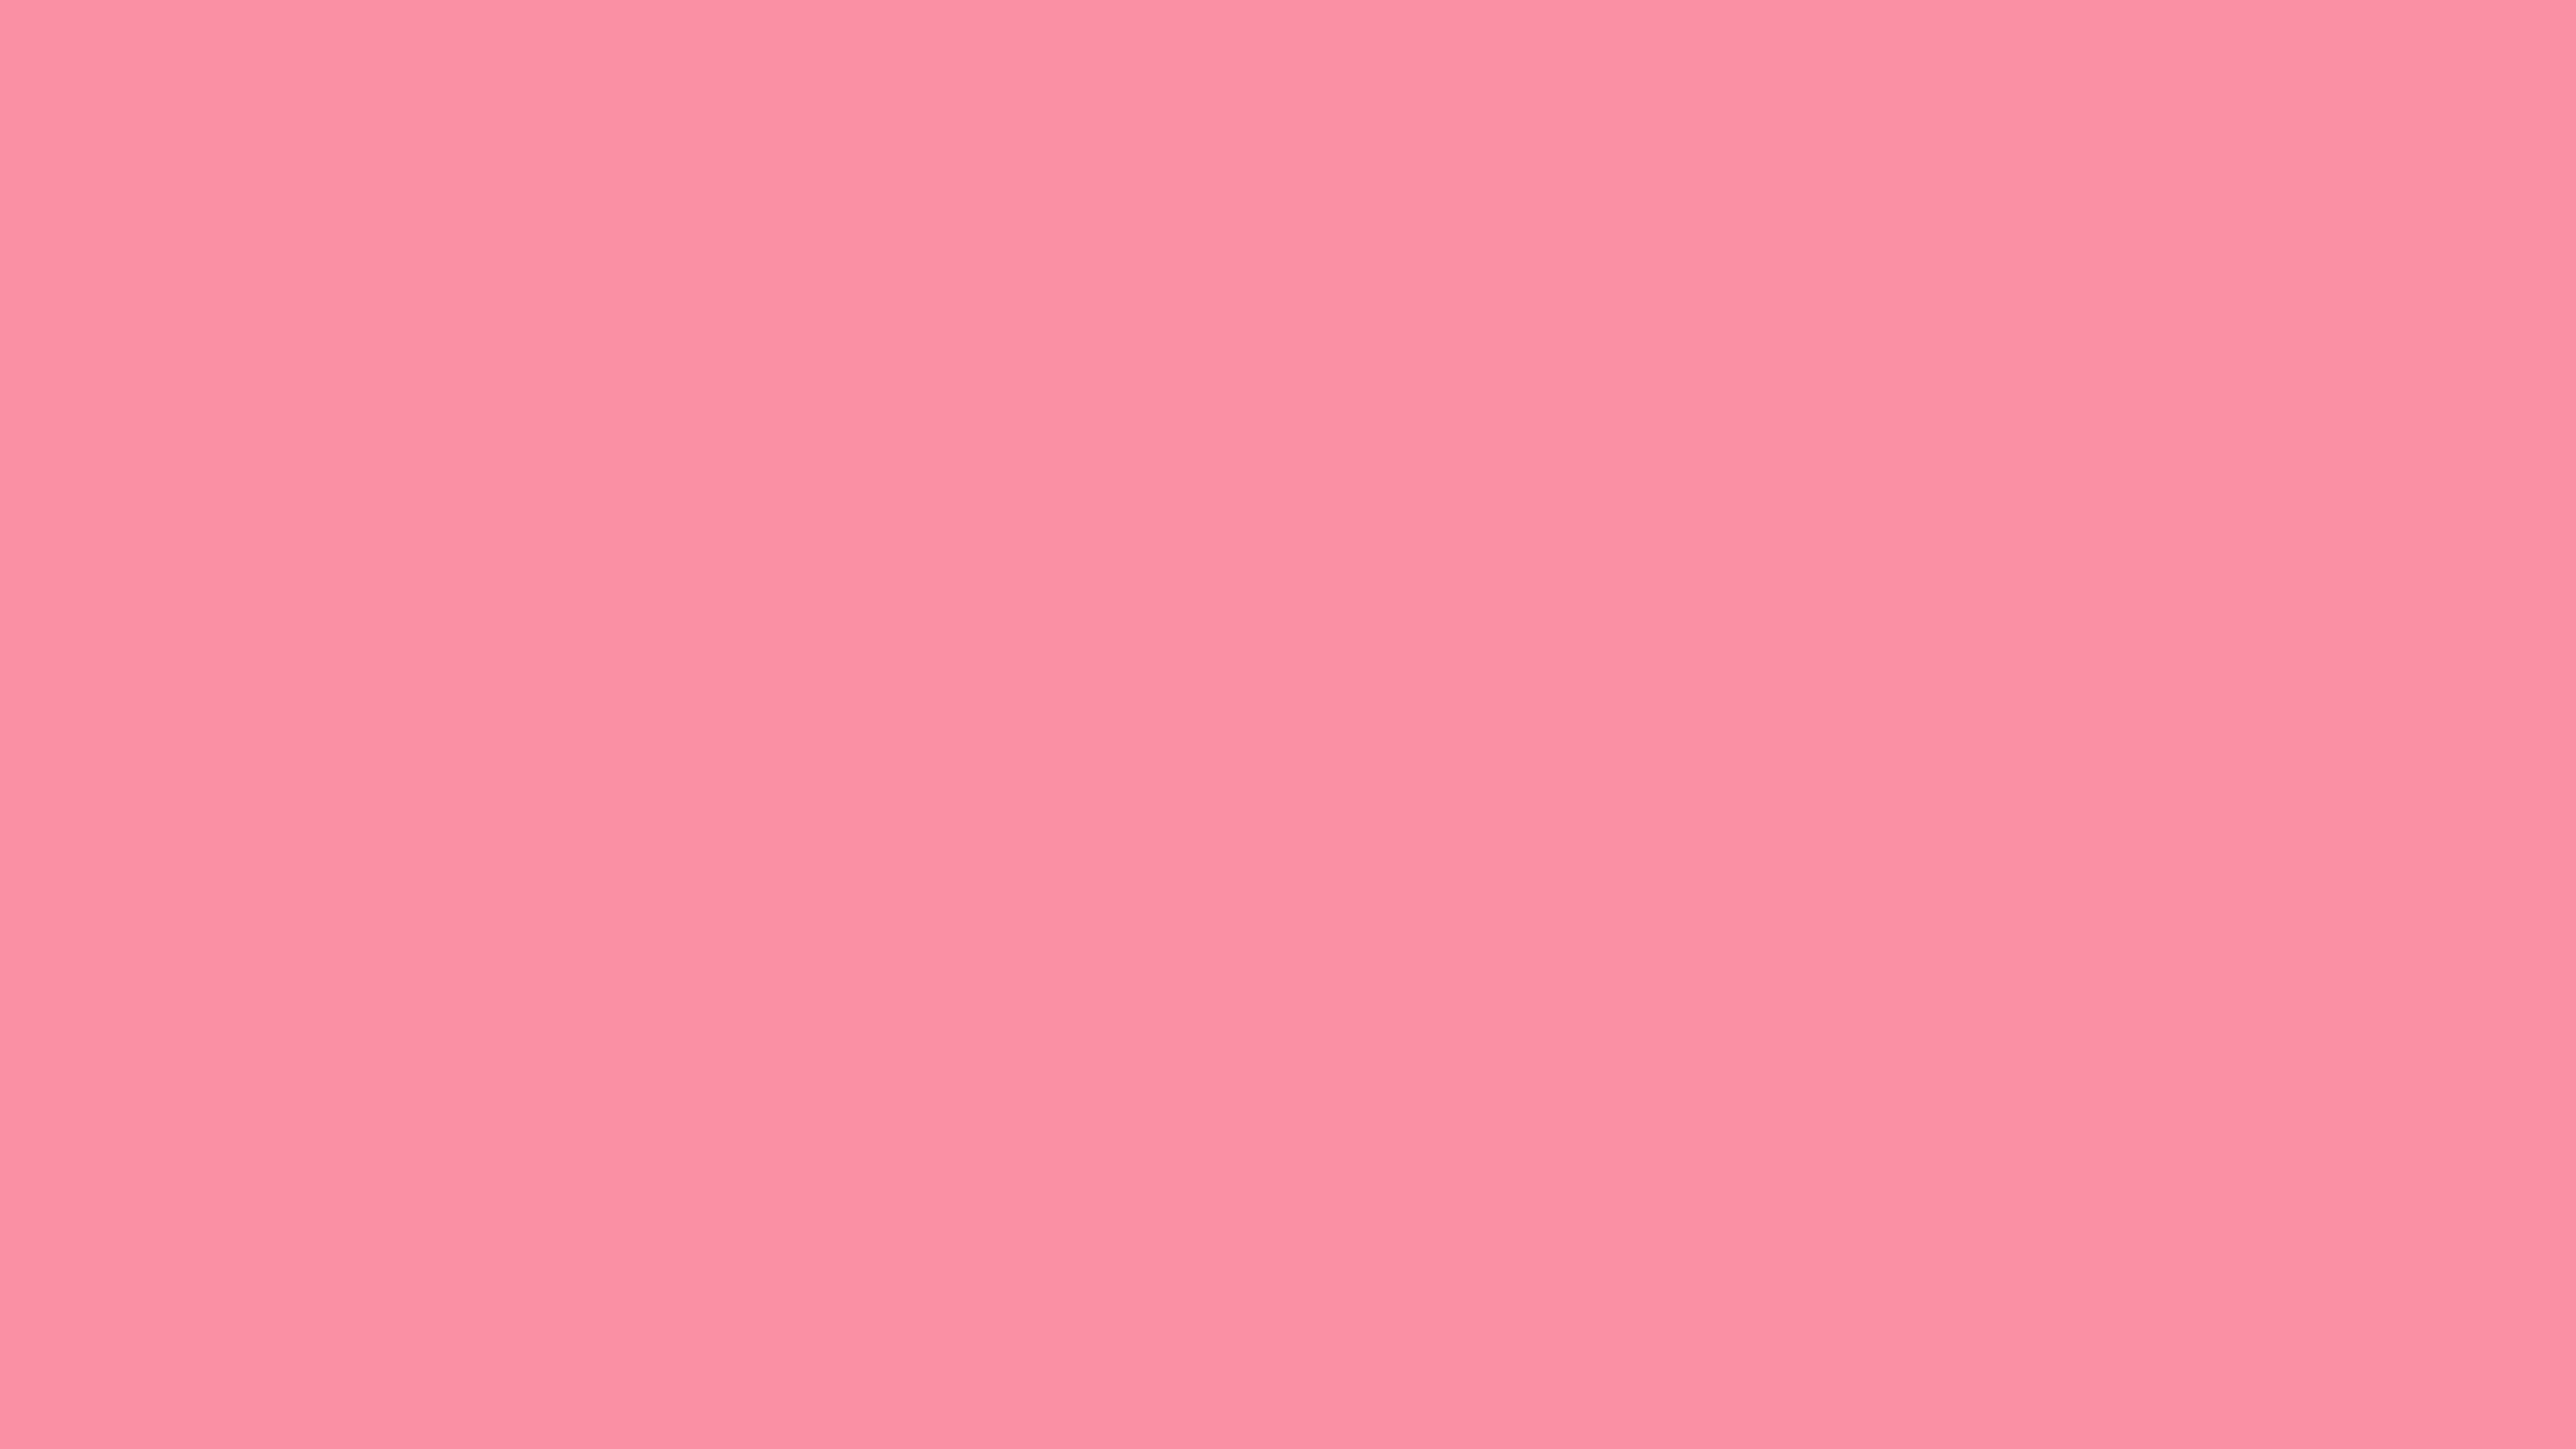 4096x2304 Pink Sherbet Solid Color Background